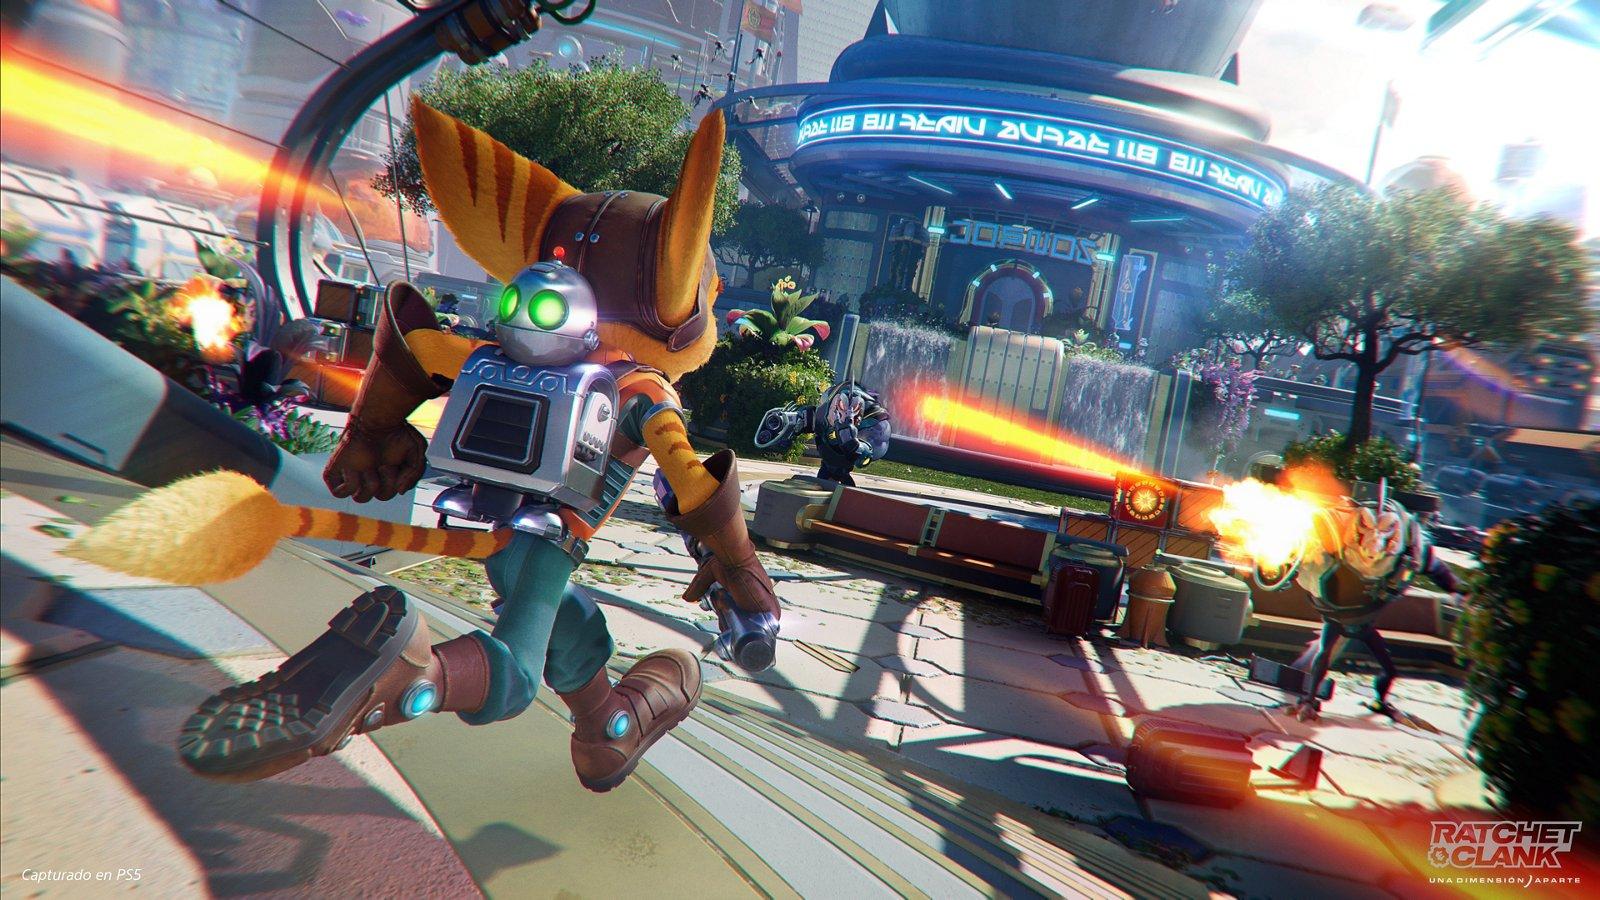 PS5 restock Ratchet and Clank screenshot